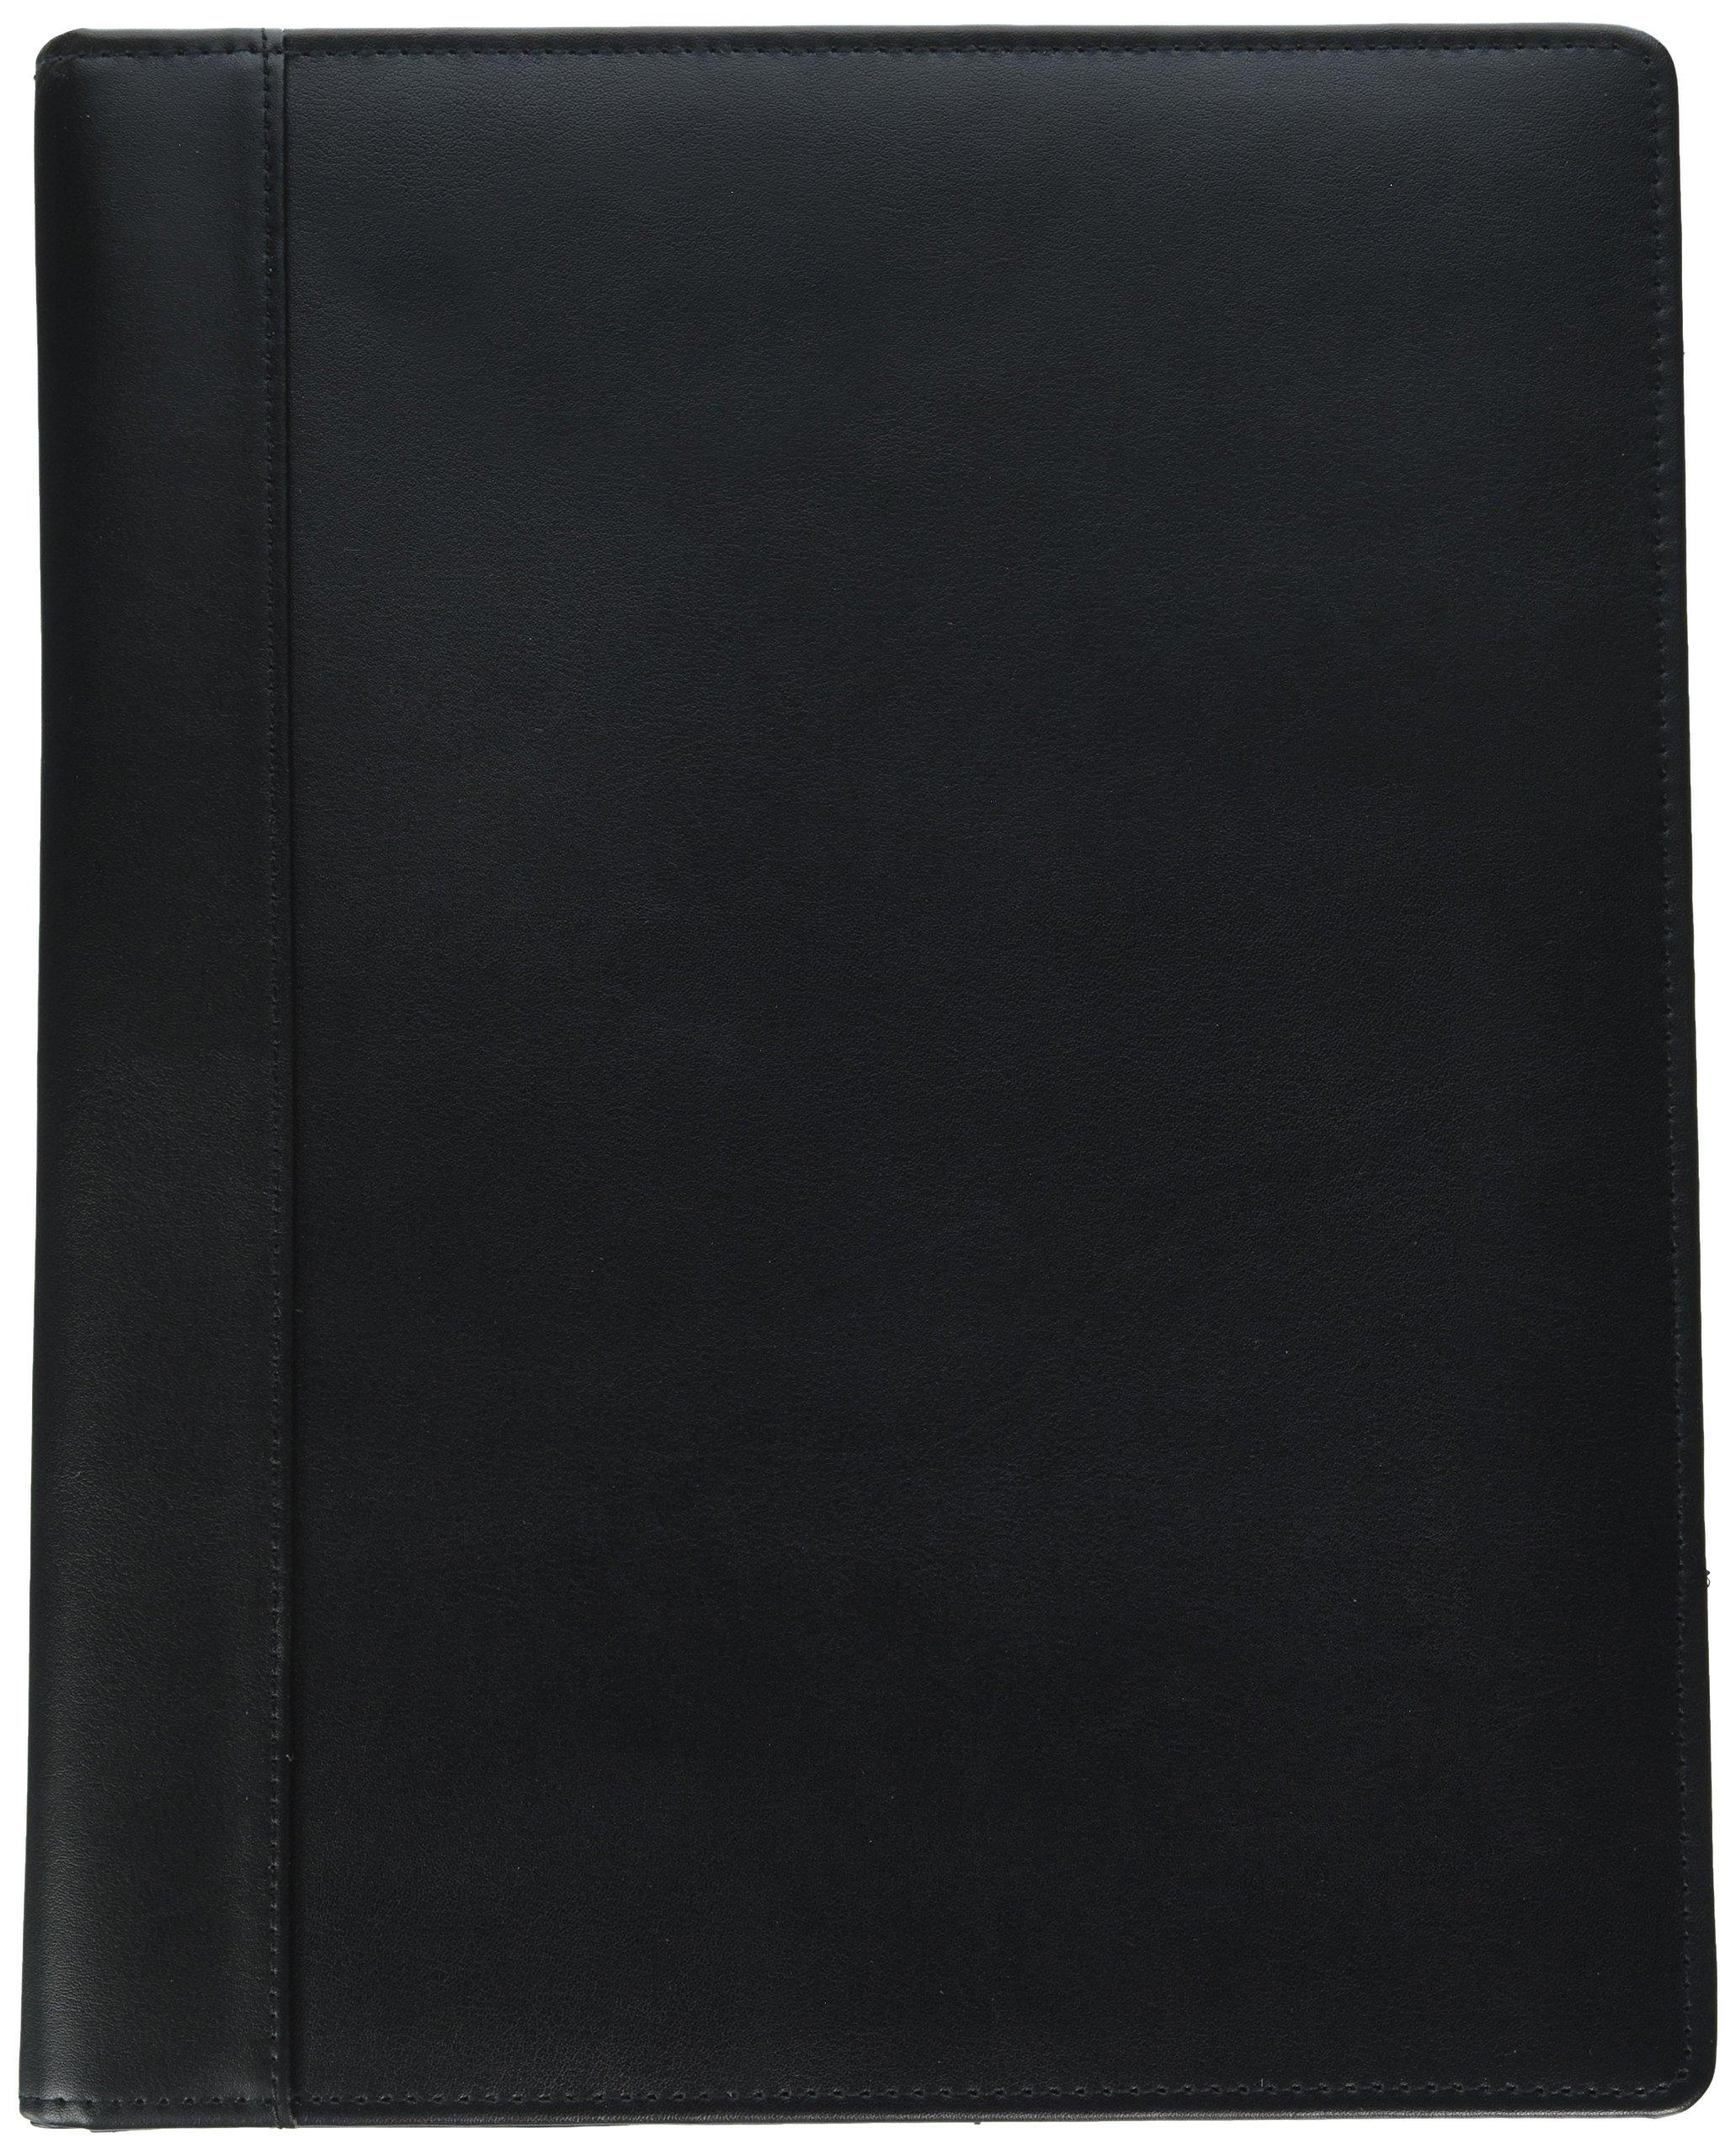 Buxton Executive Leather Padfolio, 9-1/2'' x 12-1/2'', Black (BUXOC85006BK)